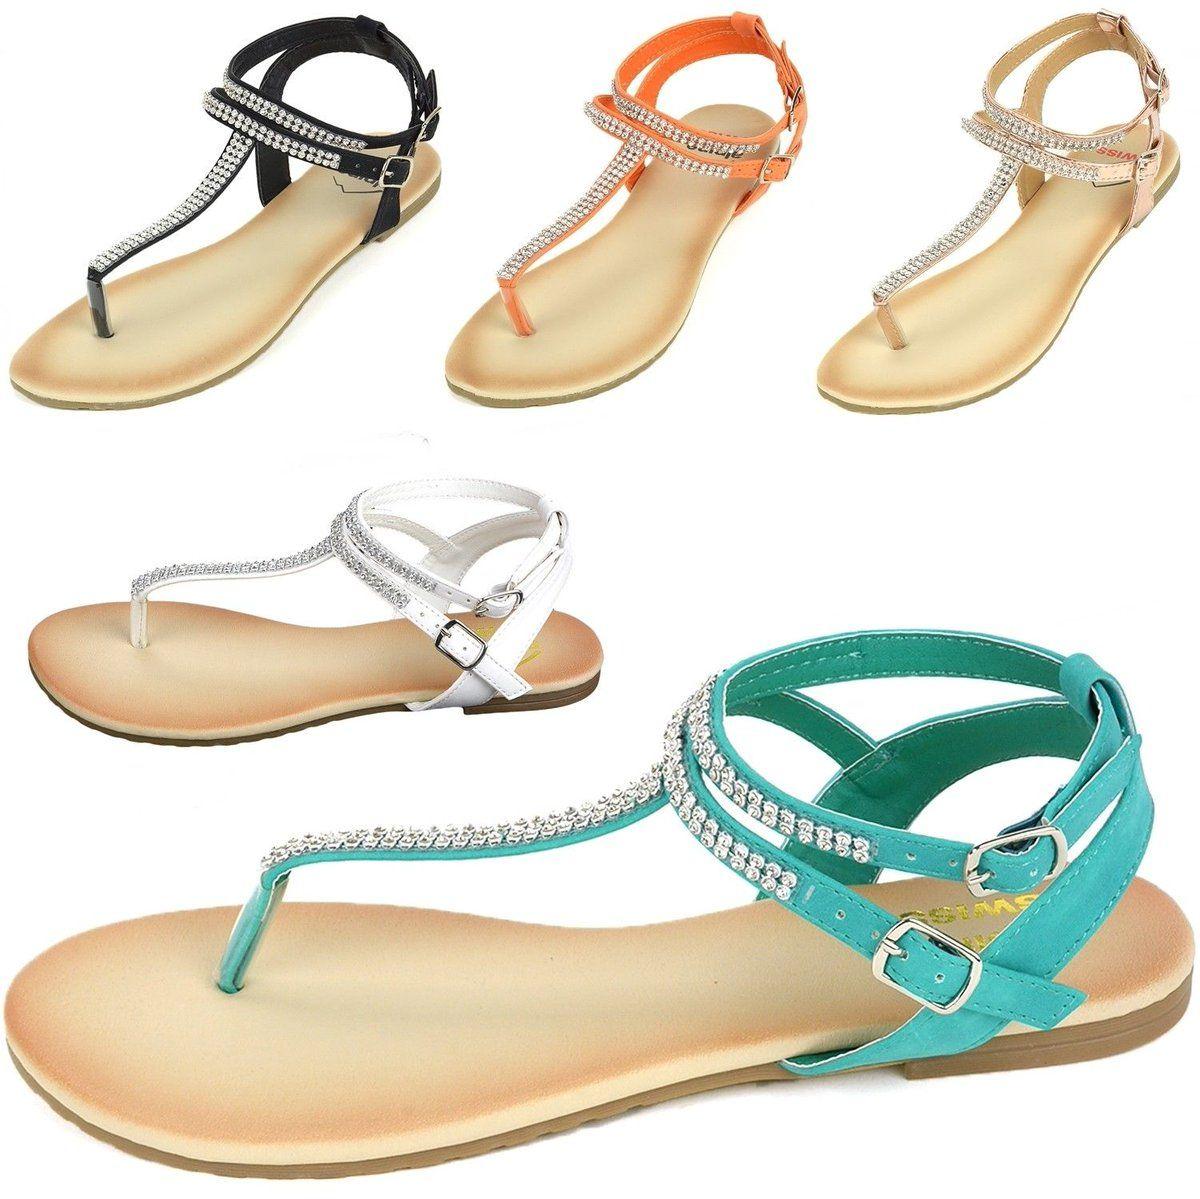 6ce2f308c9ee Details about Alpine Swiss Women s Gladiator Sandals T-Strap ...